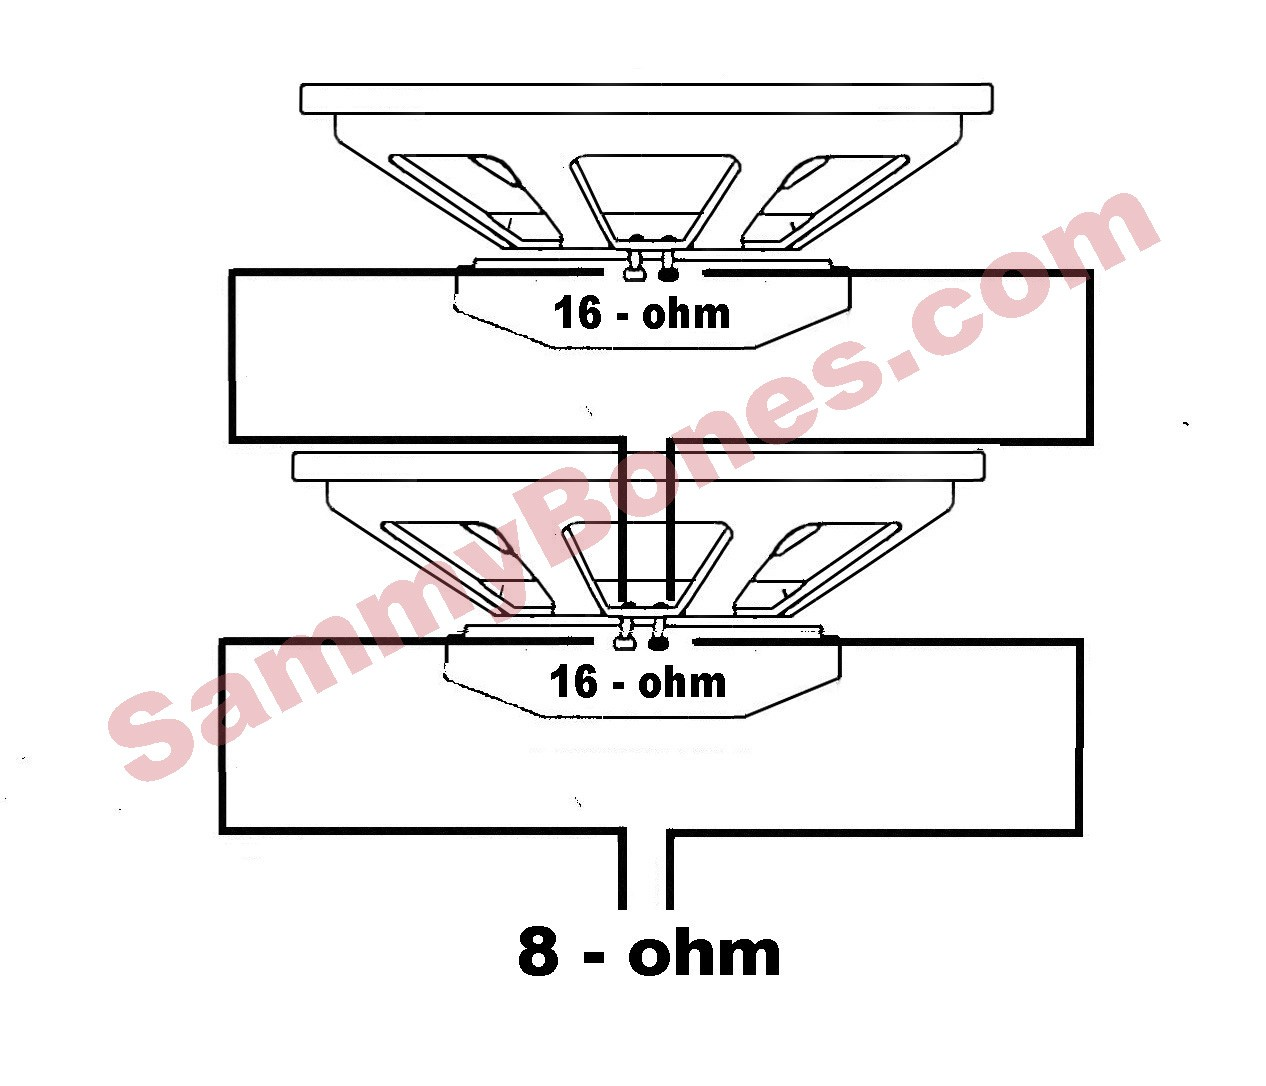 4 ohm guitar speaker wiring diagram